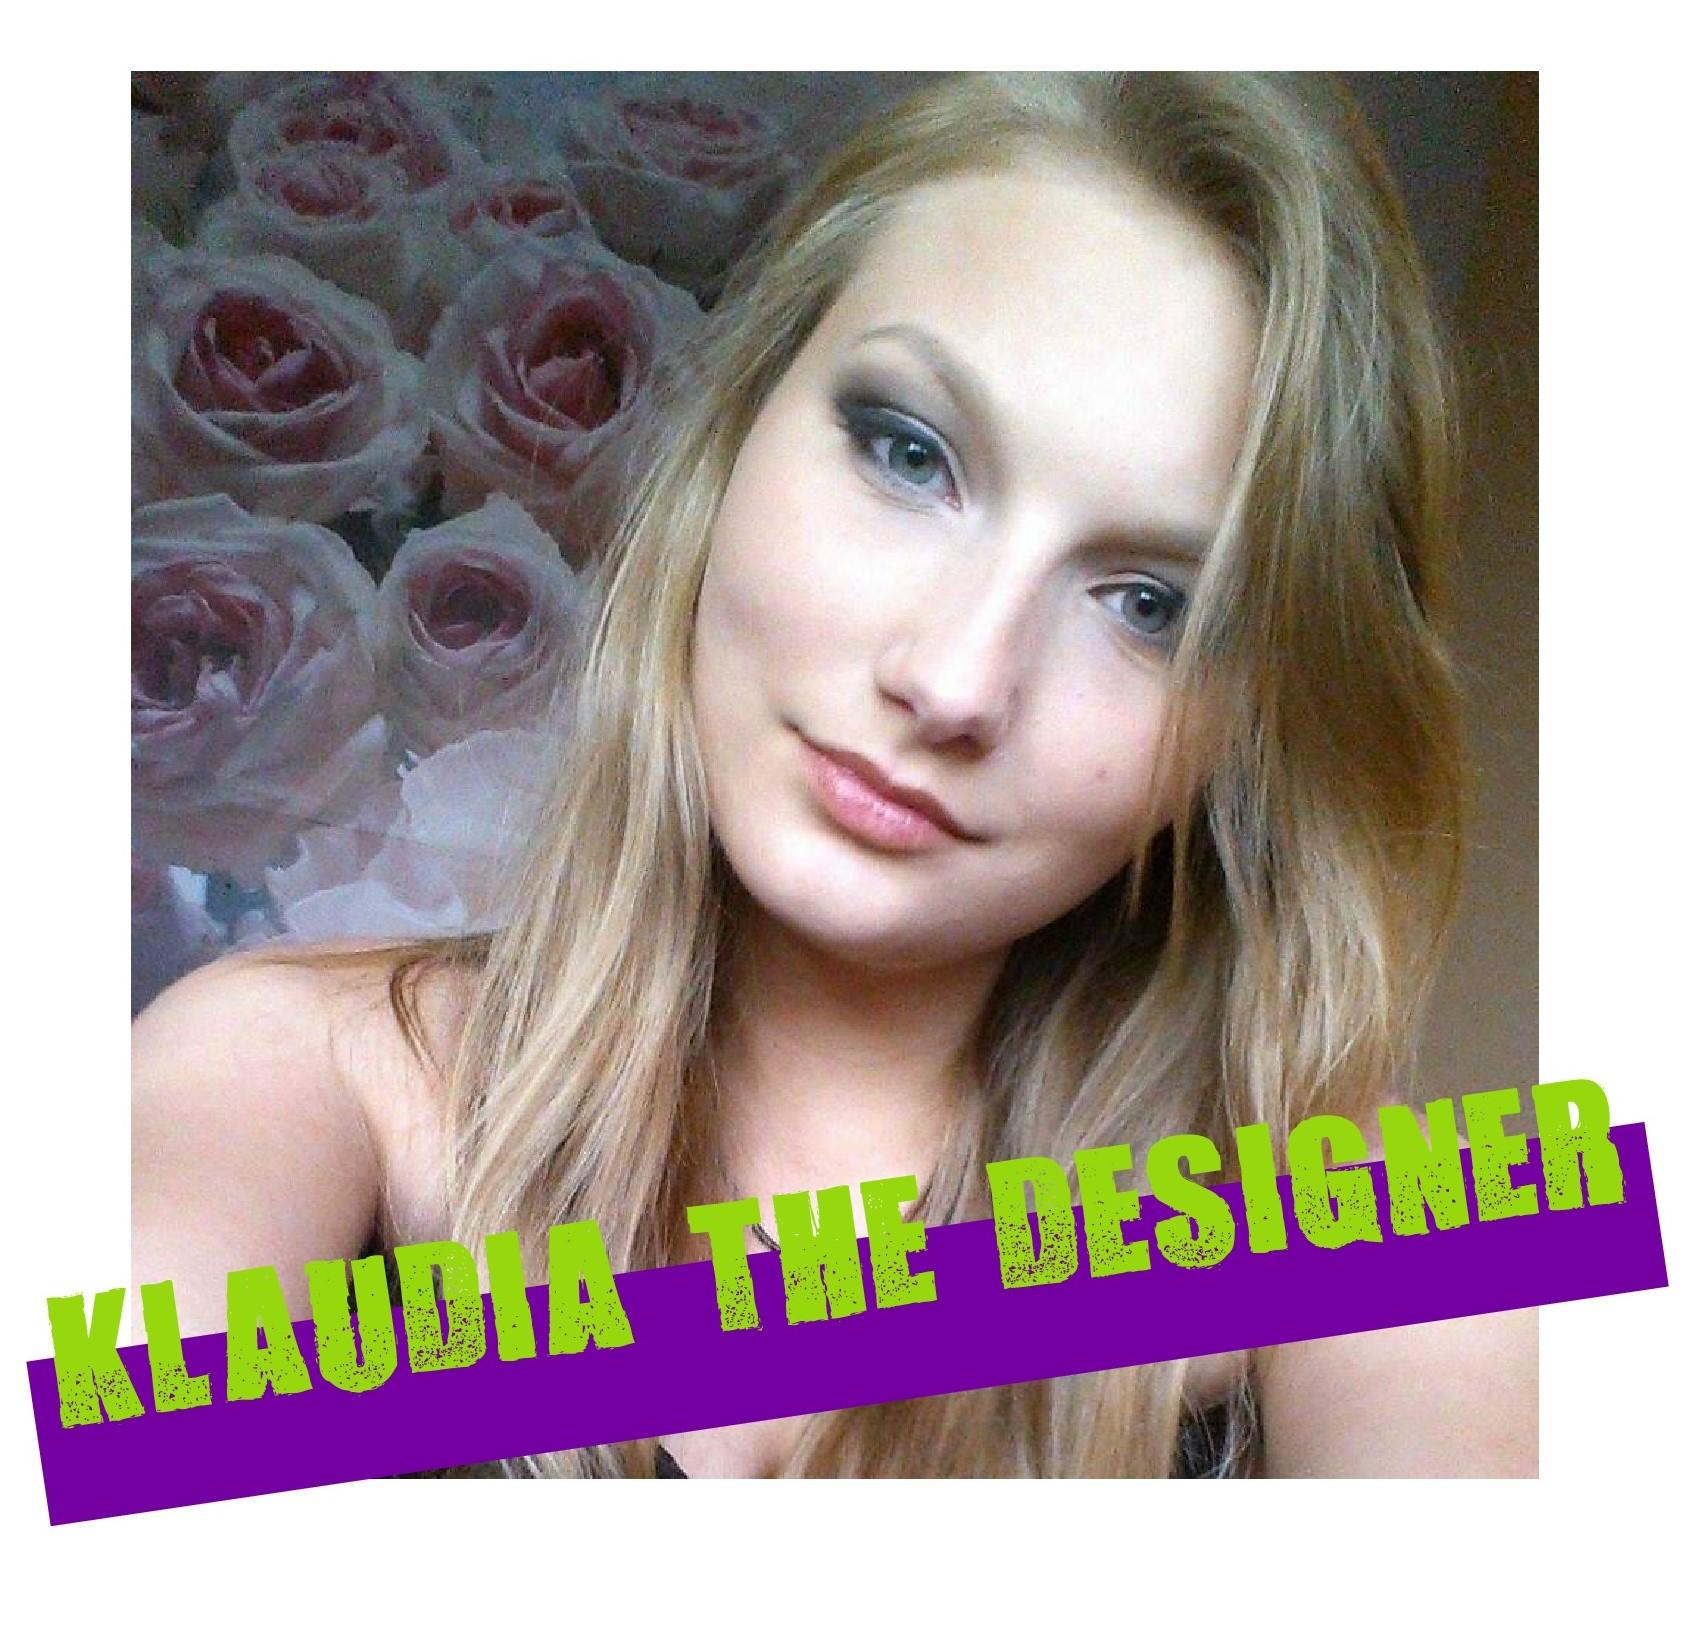 klaudia-the-designer-2.jpg